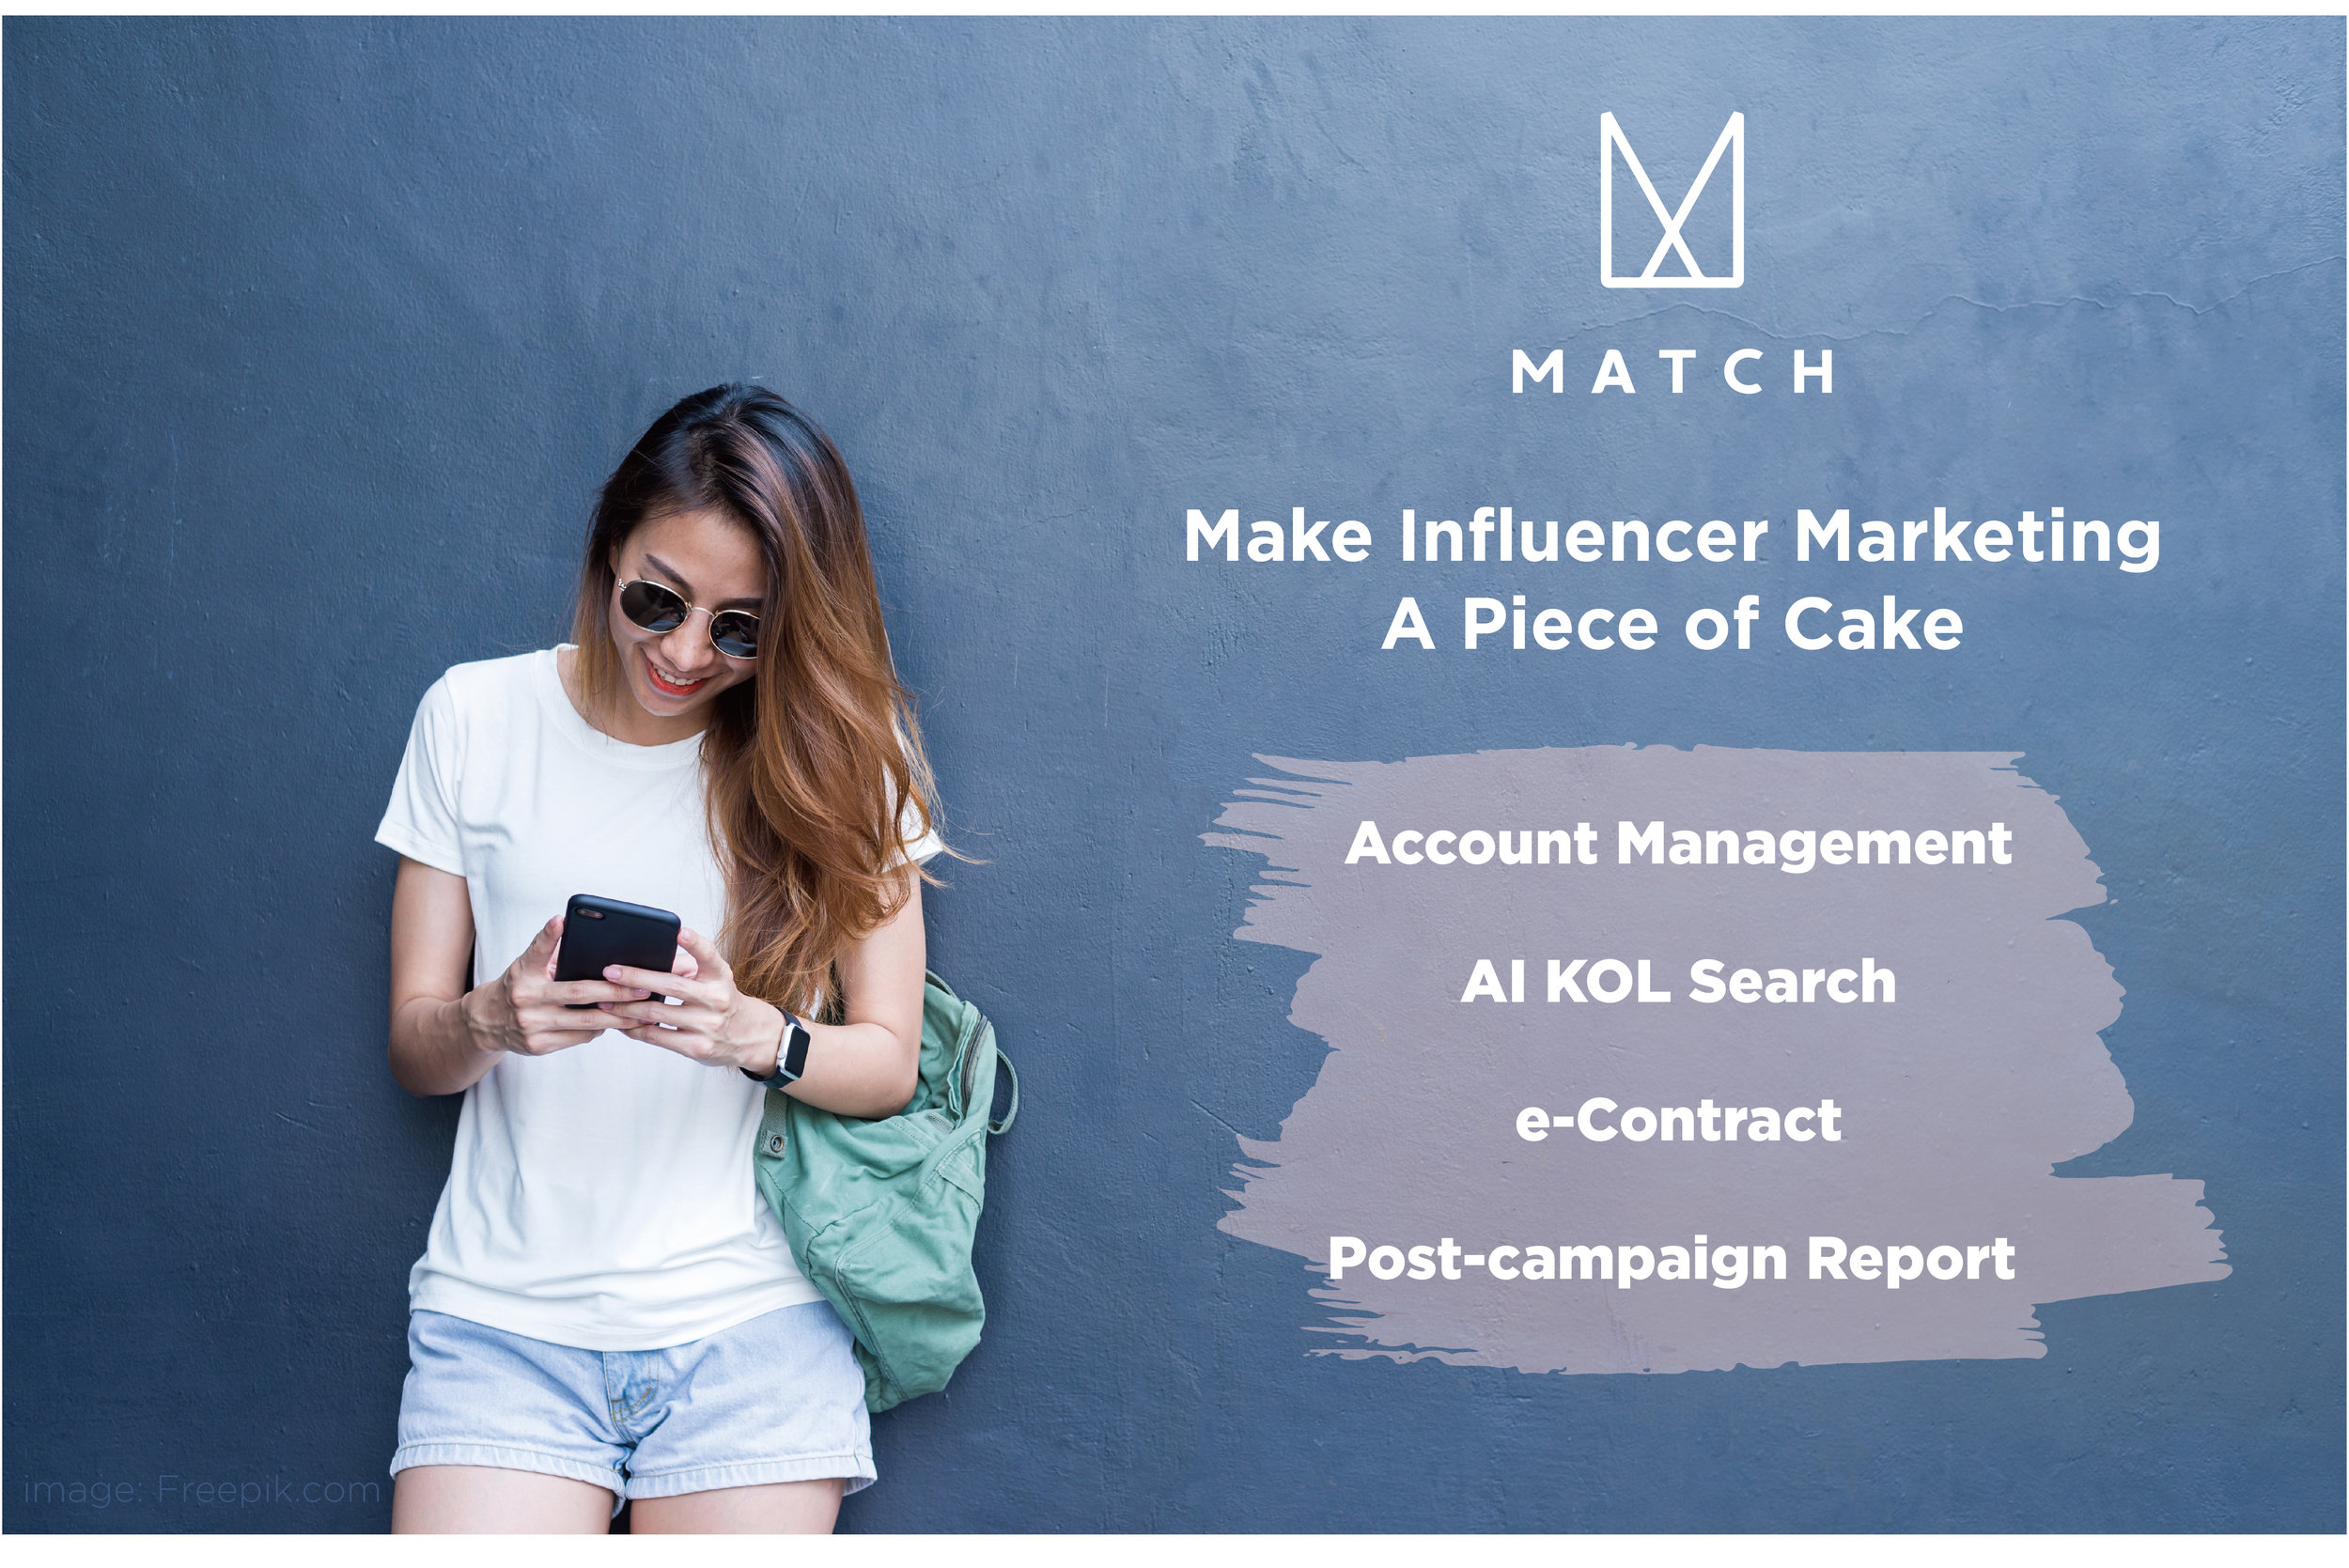 MatchNow_Product_Image.jpg